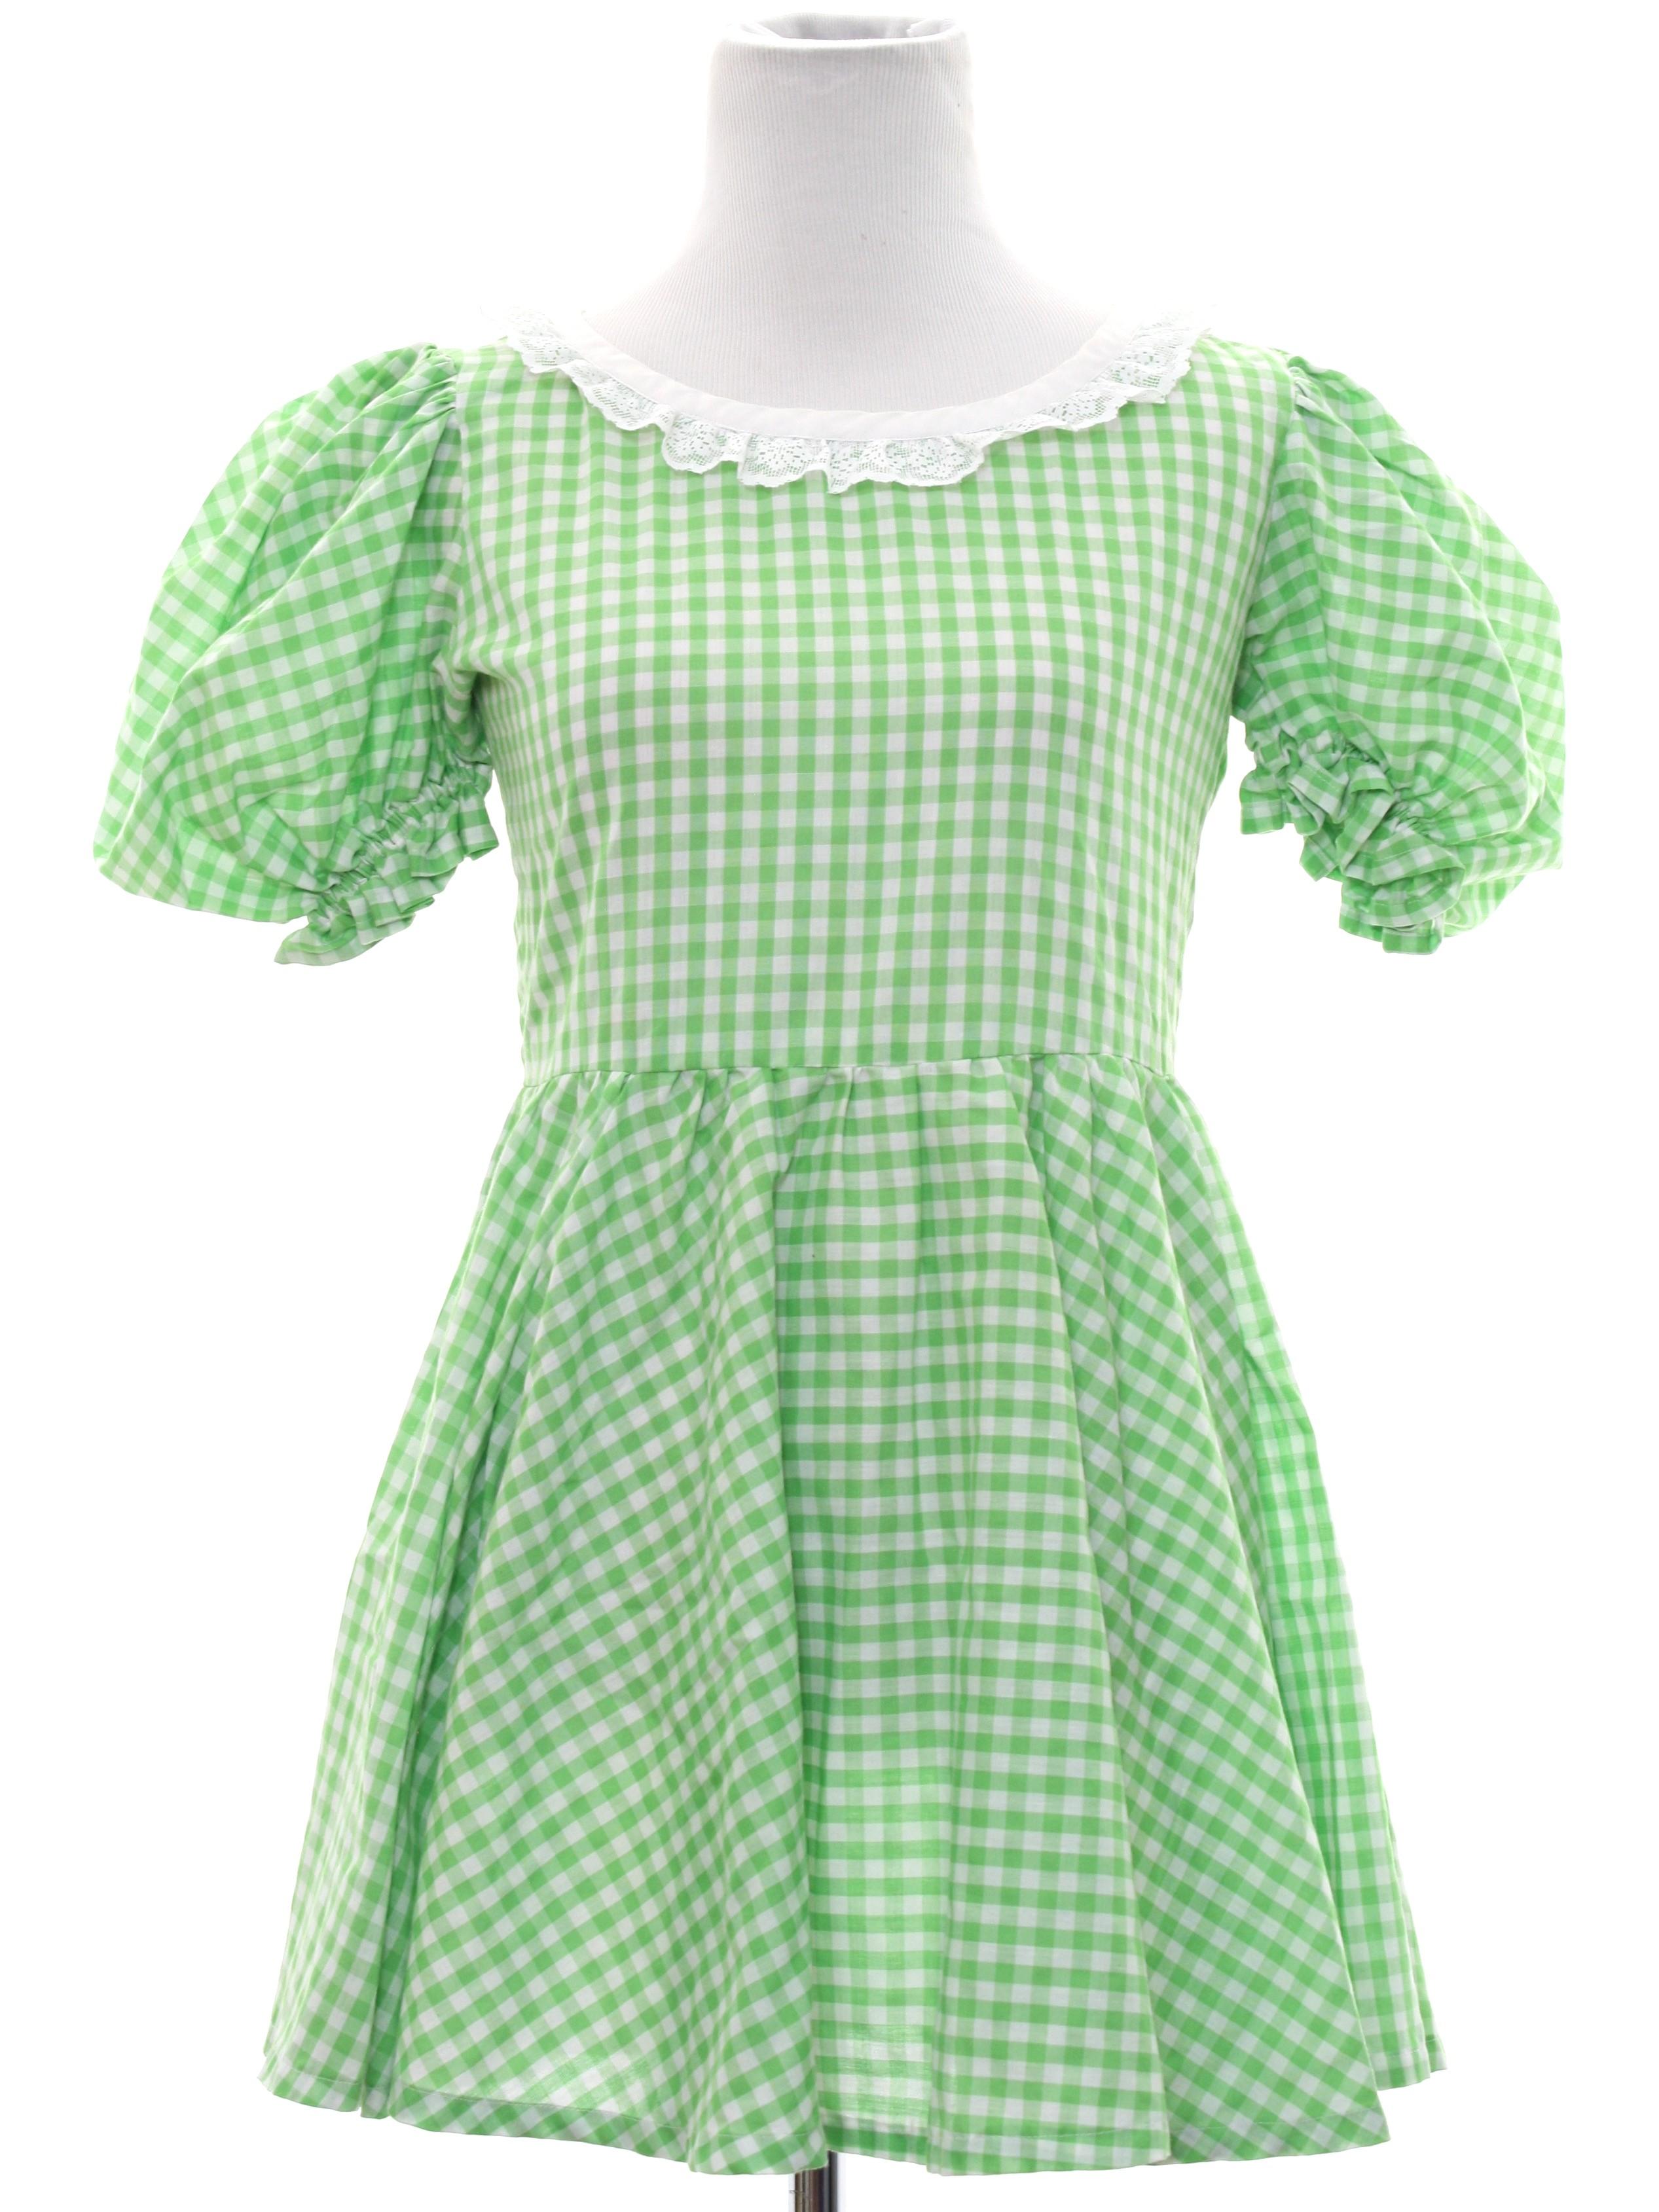 Retro Sixties Mini Dress Late 60s Or Early 70s Home Sewn